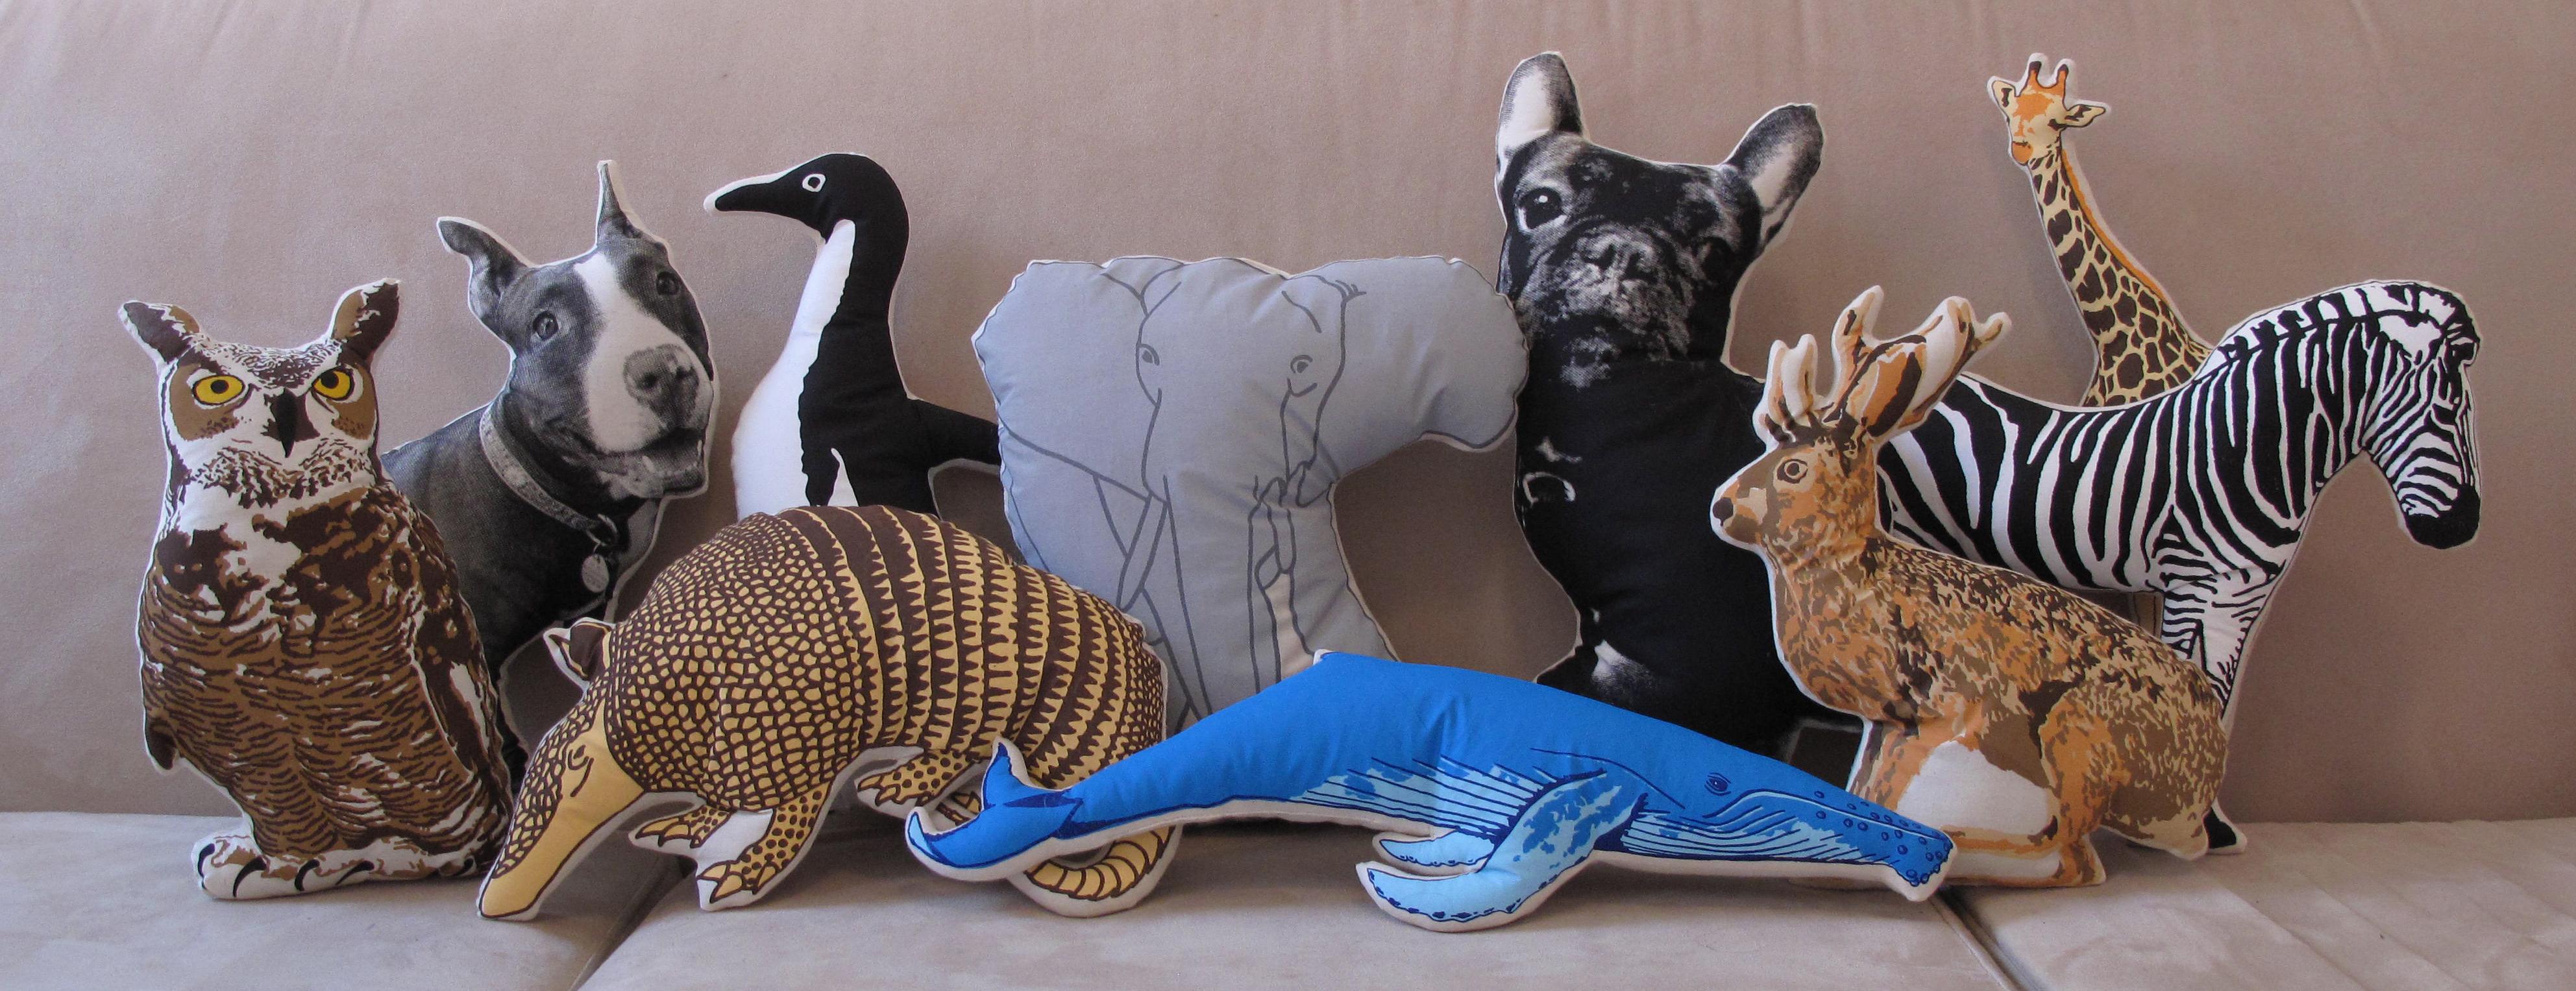 Group of fake zoo animals